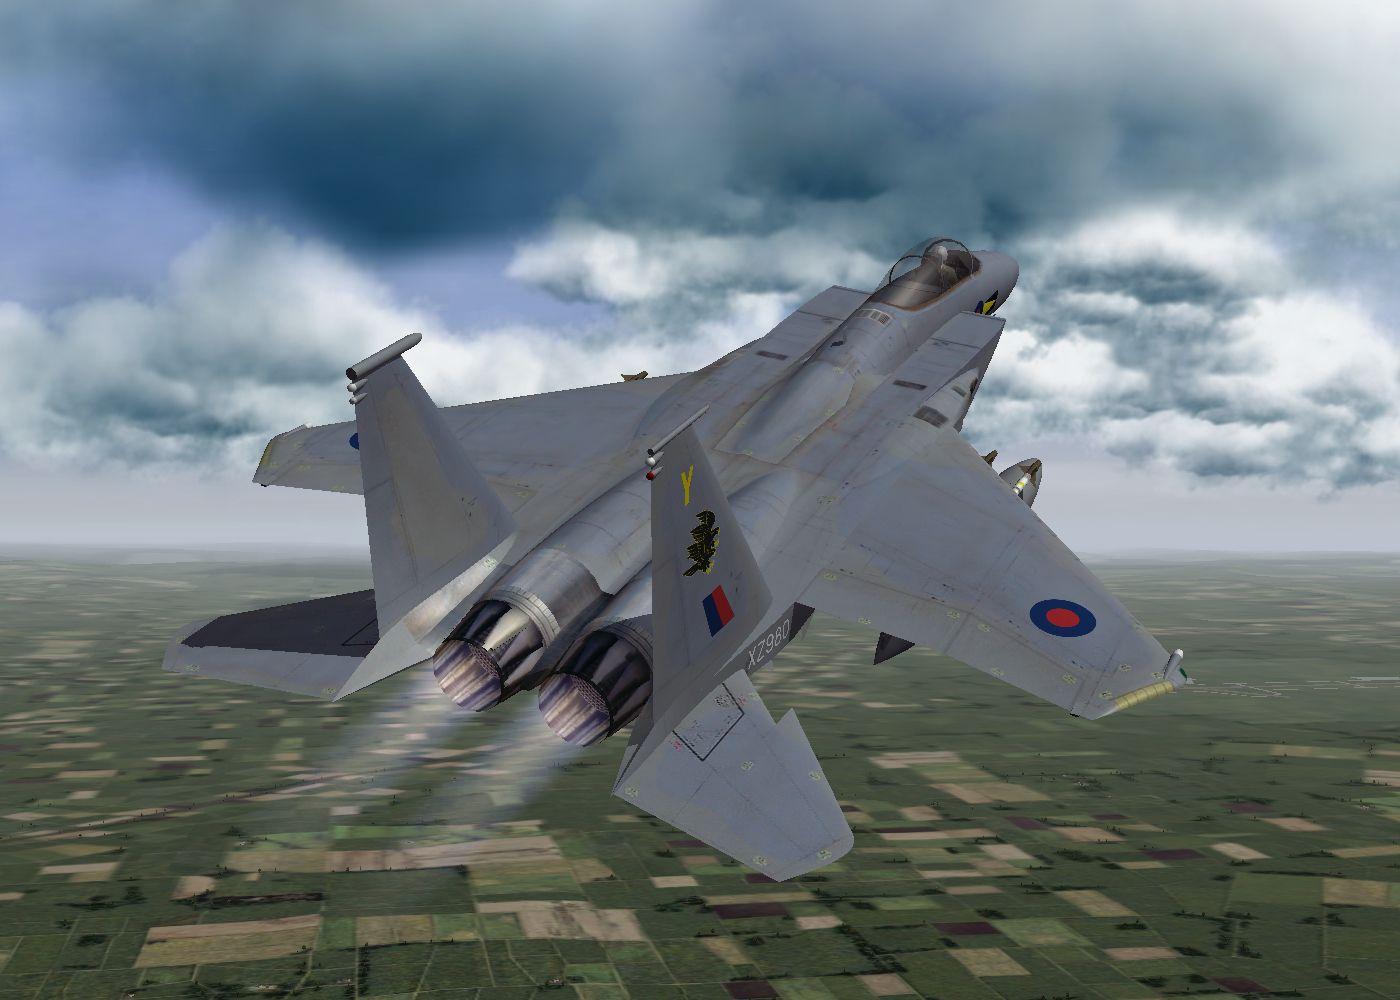 RAF%20EAGLE%20F1.09_zps4sdbrkic.jpg